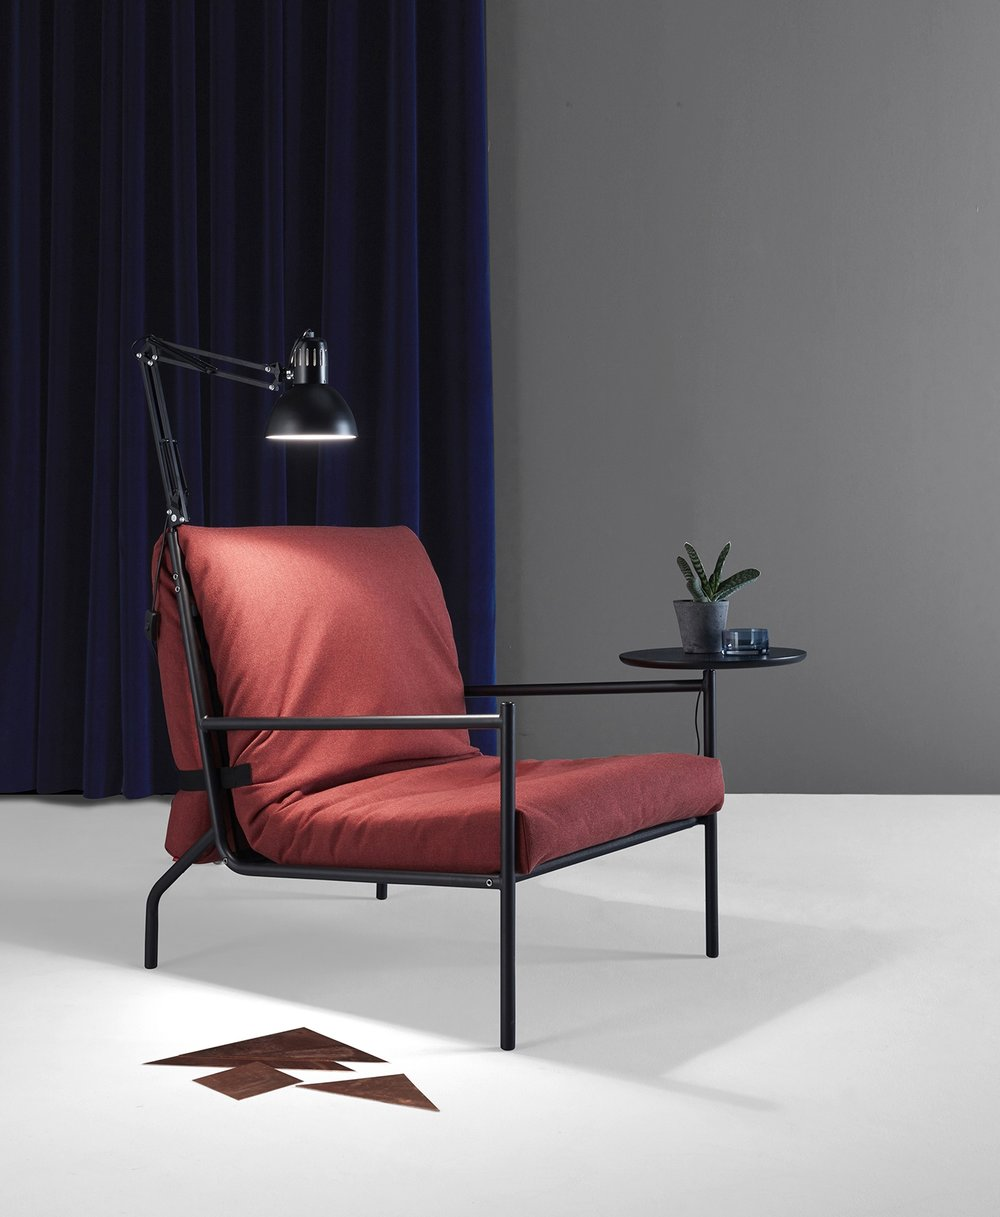 Noir  Chair Bed